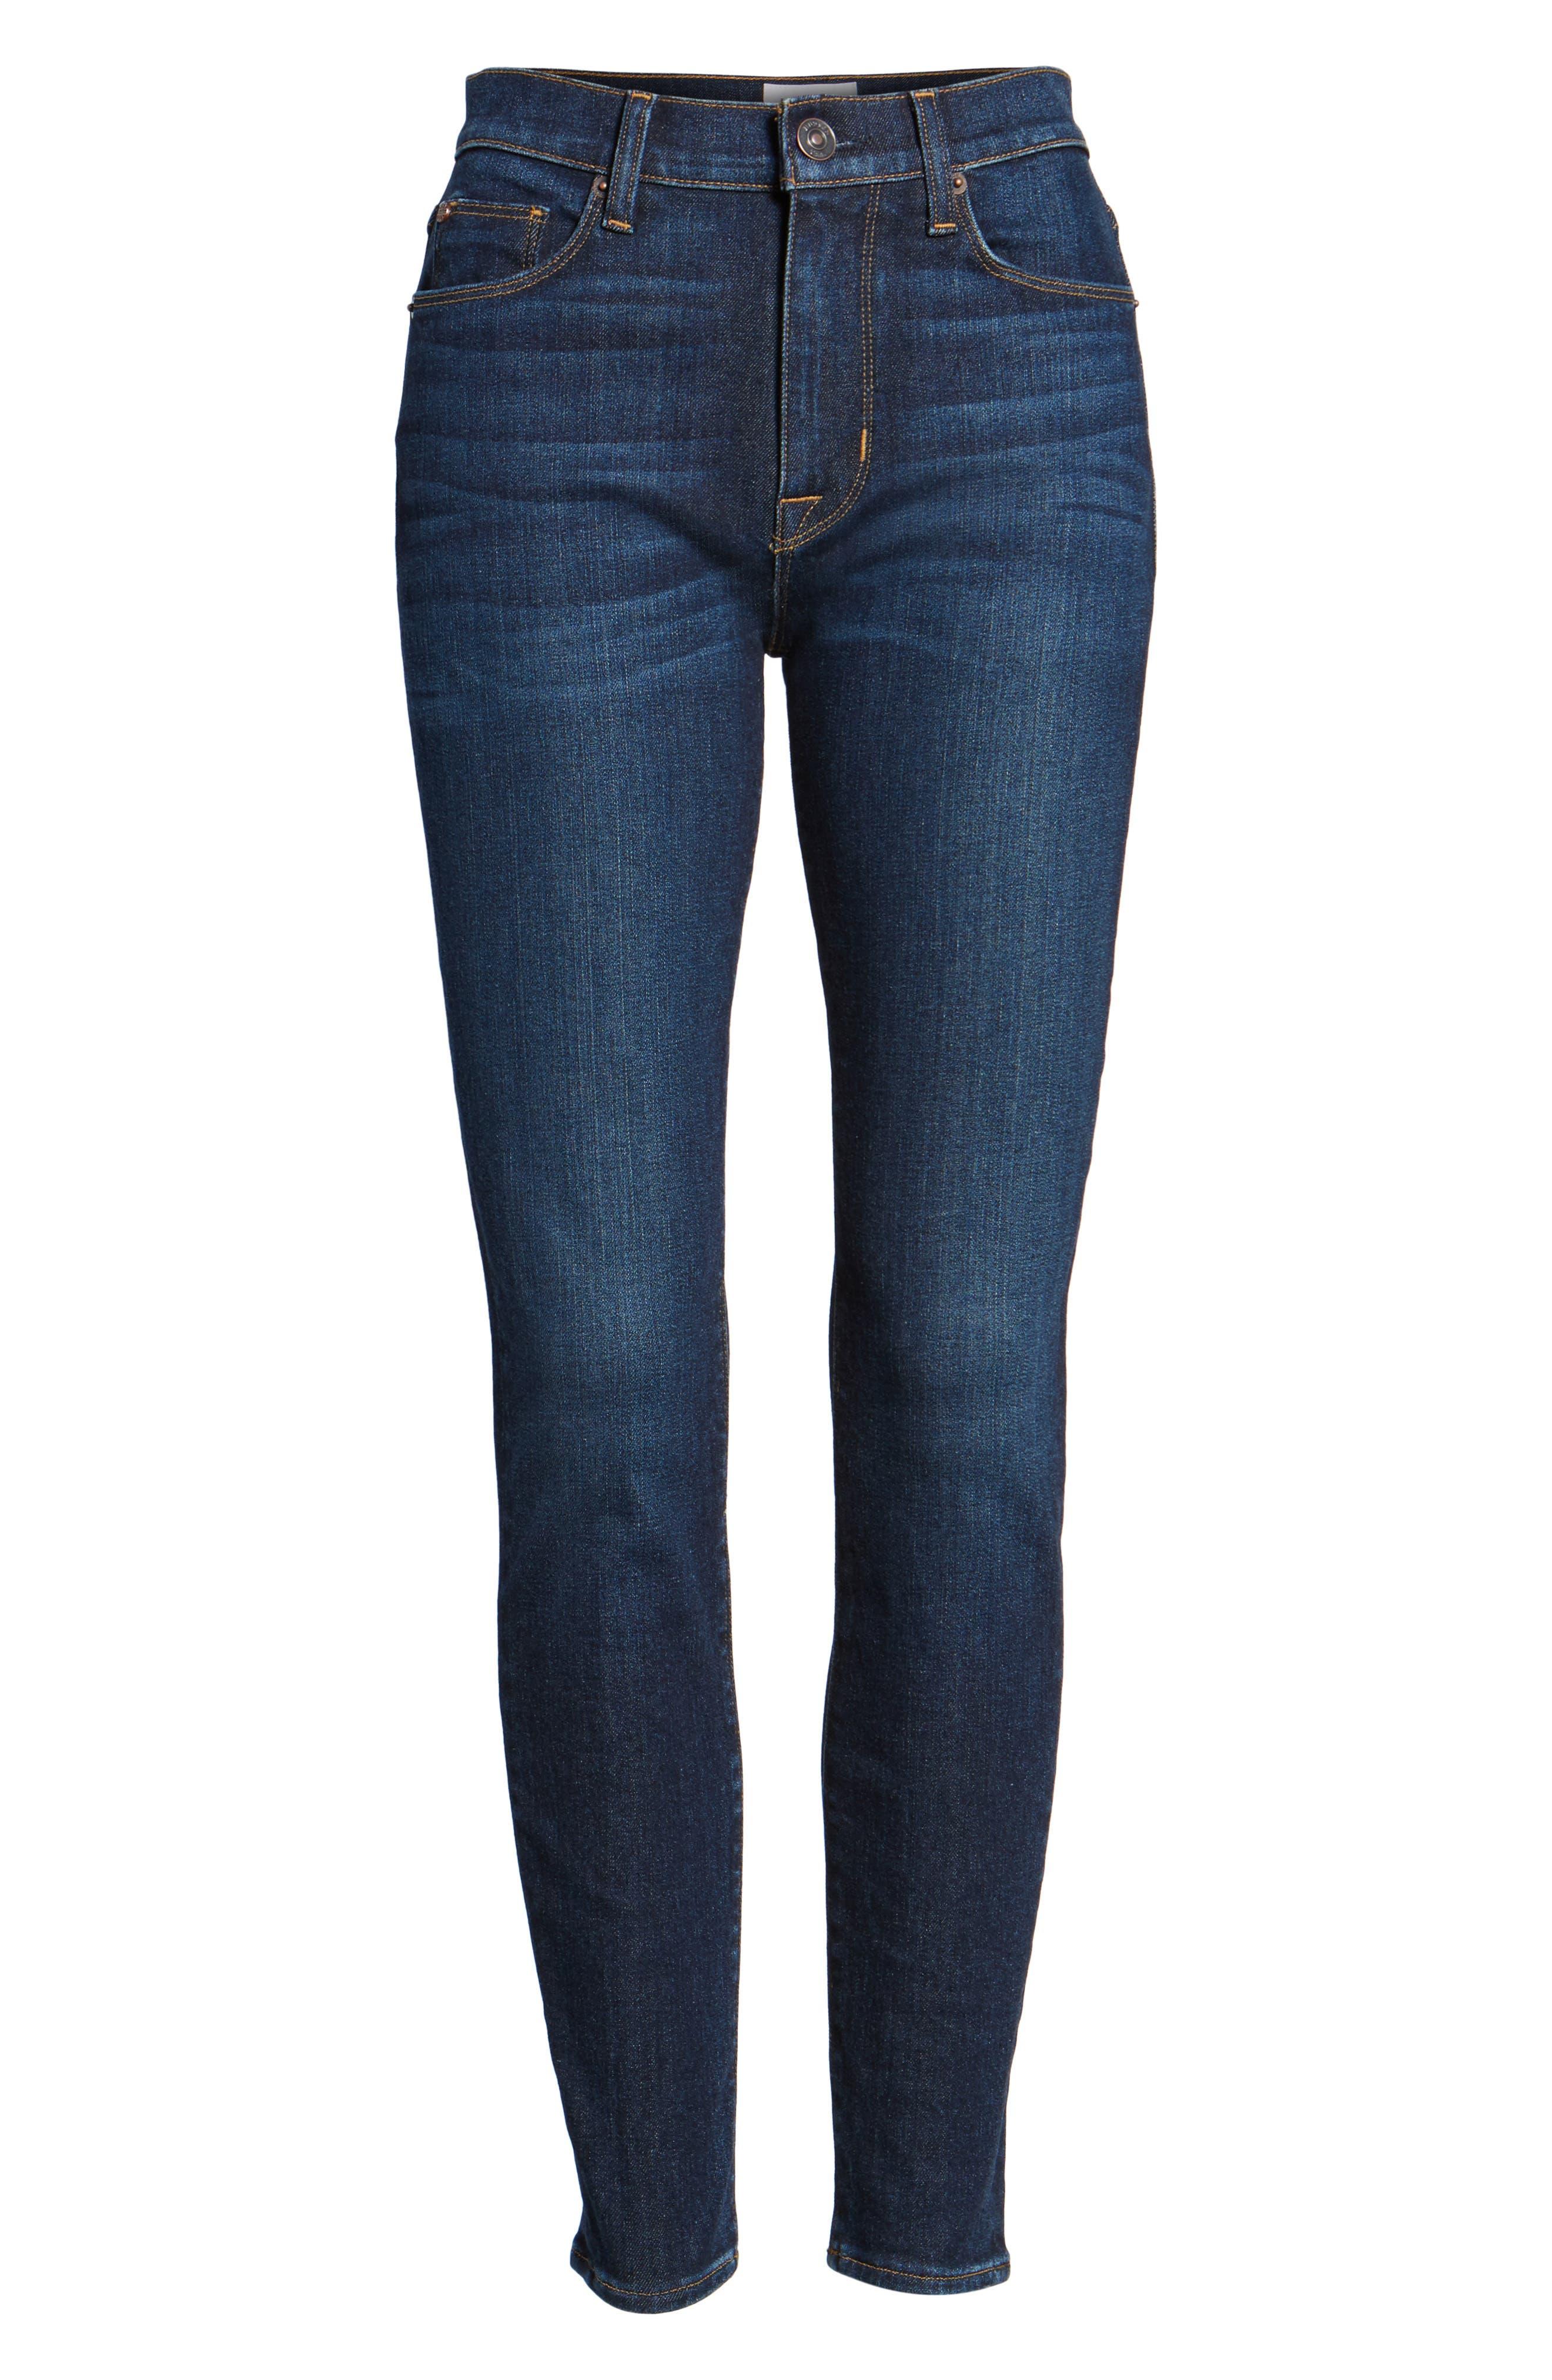 Barbara High Waist Ankle Super Skinny Jeans,                             Alternate thumbnail 11, color,